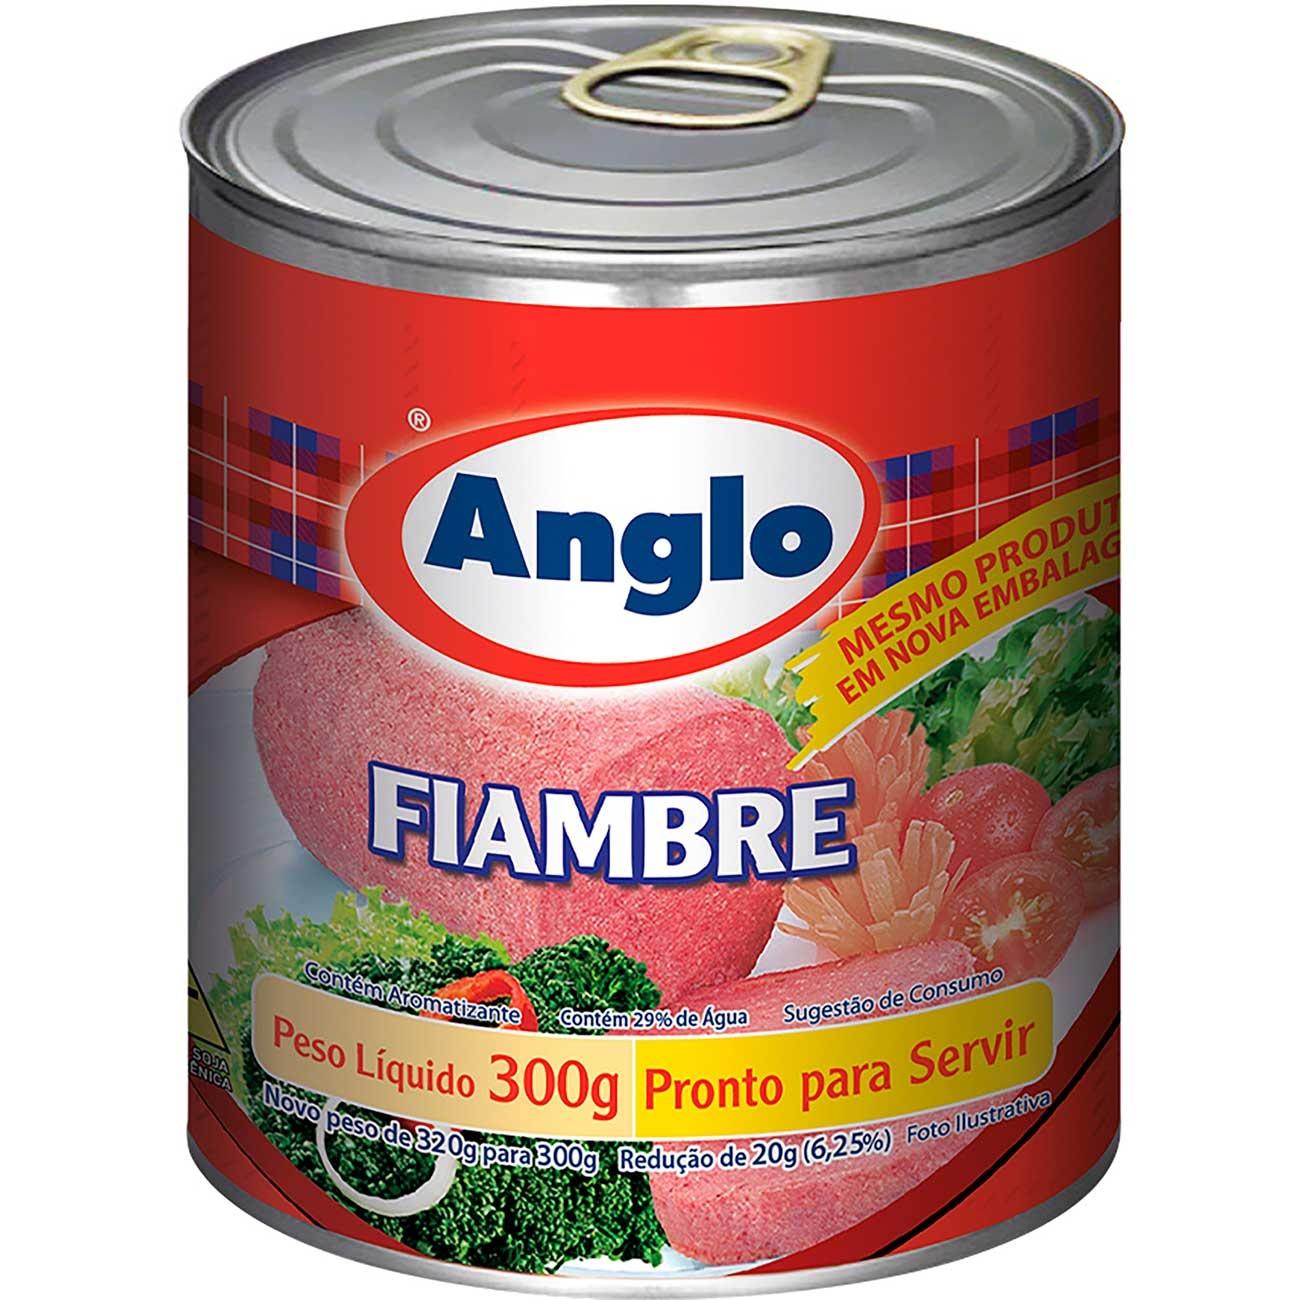 Fiambre Anglo Pic Nic Lata 300g | Caixa com 24 unidades